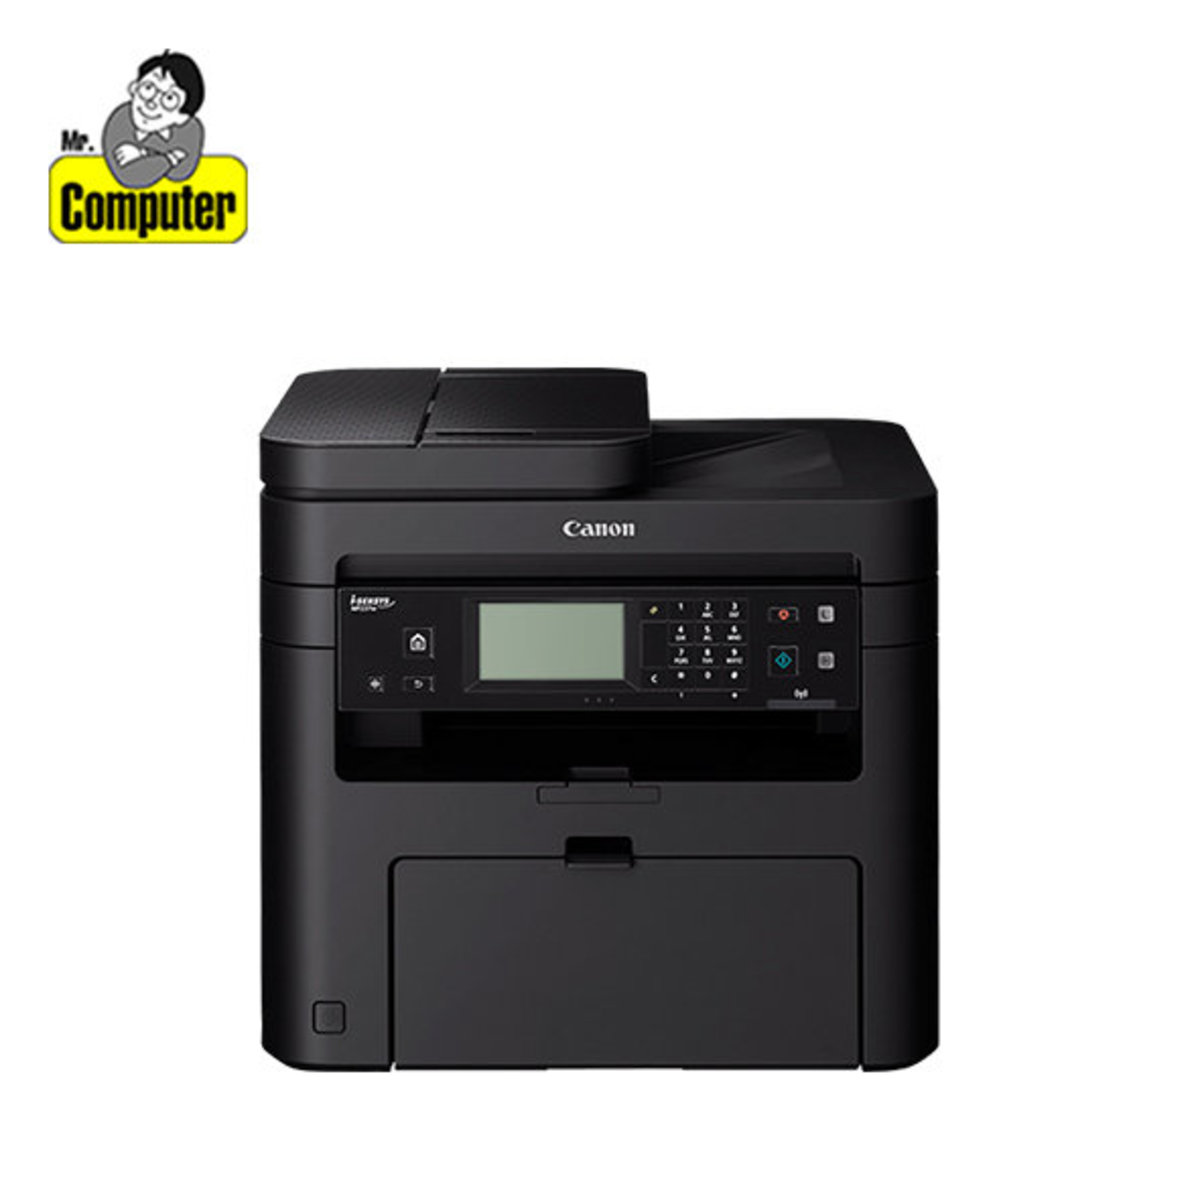 MF237w Black and White 4 in 1 Laser Printer